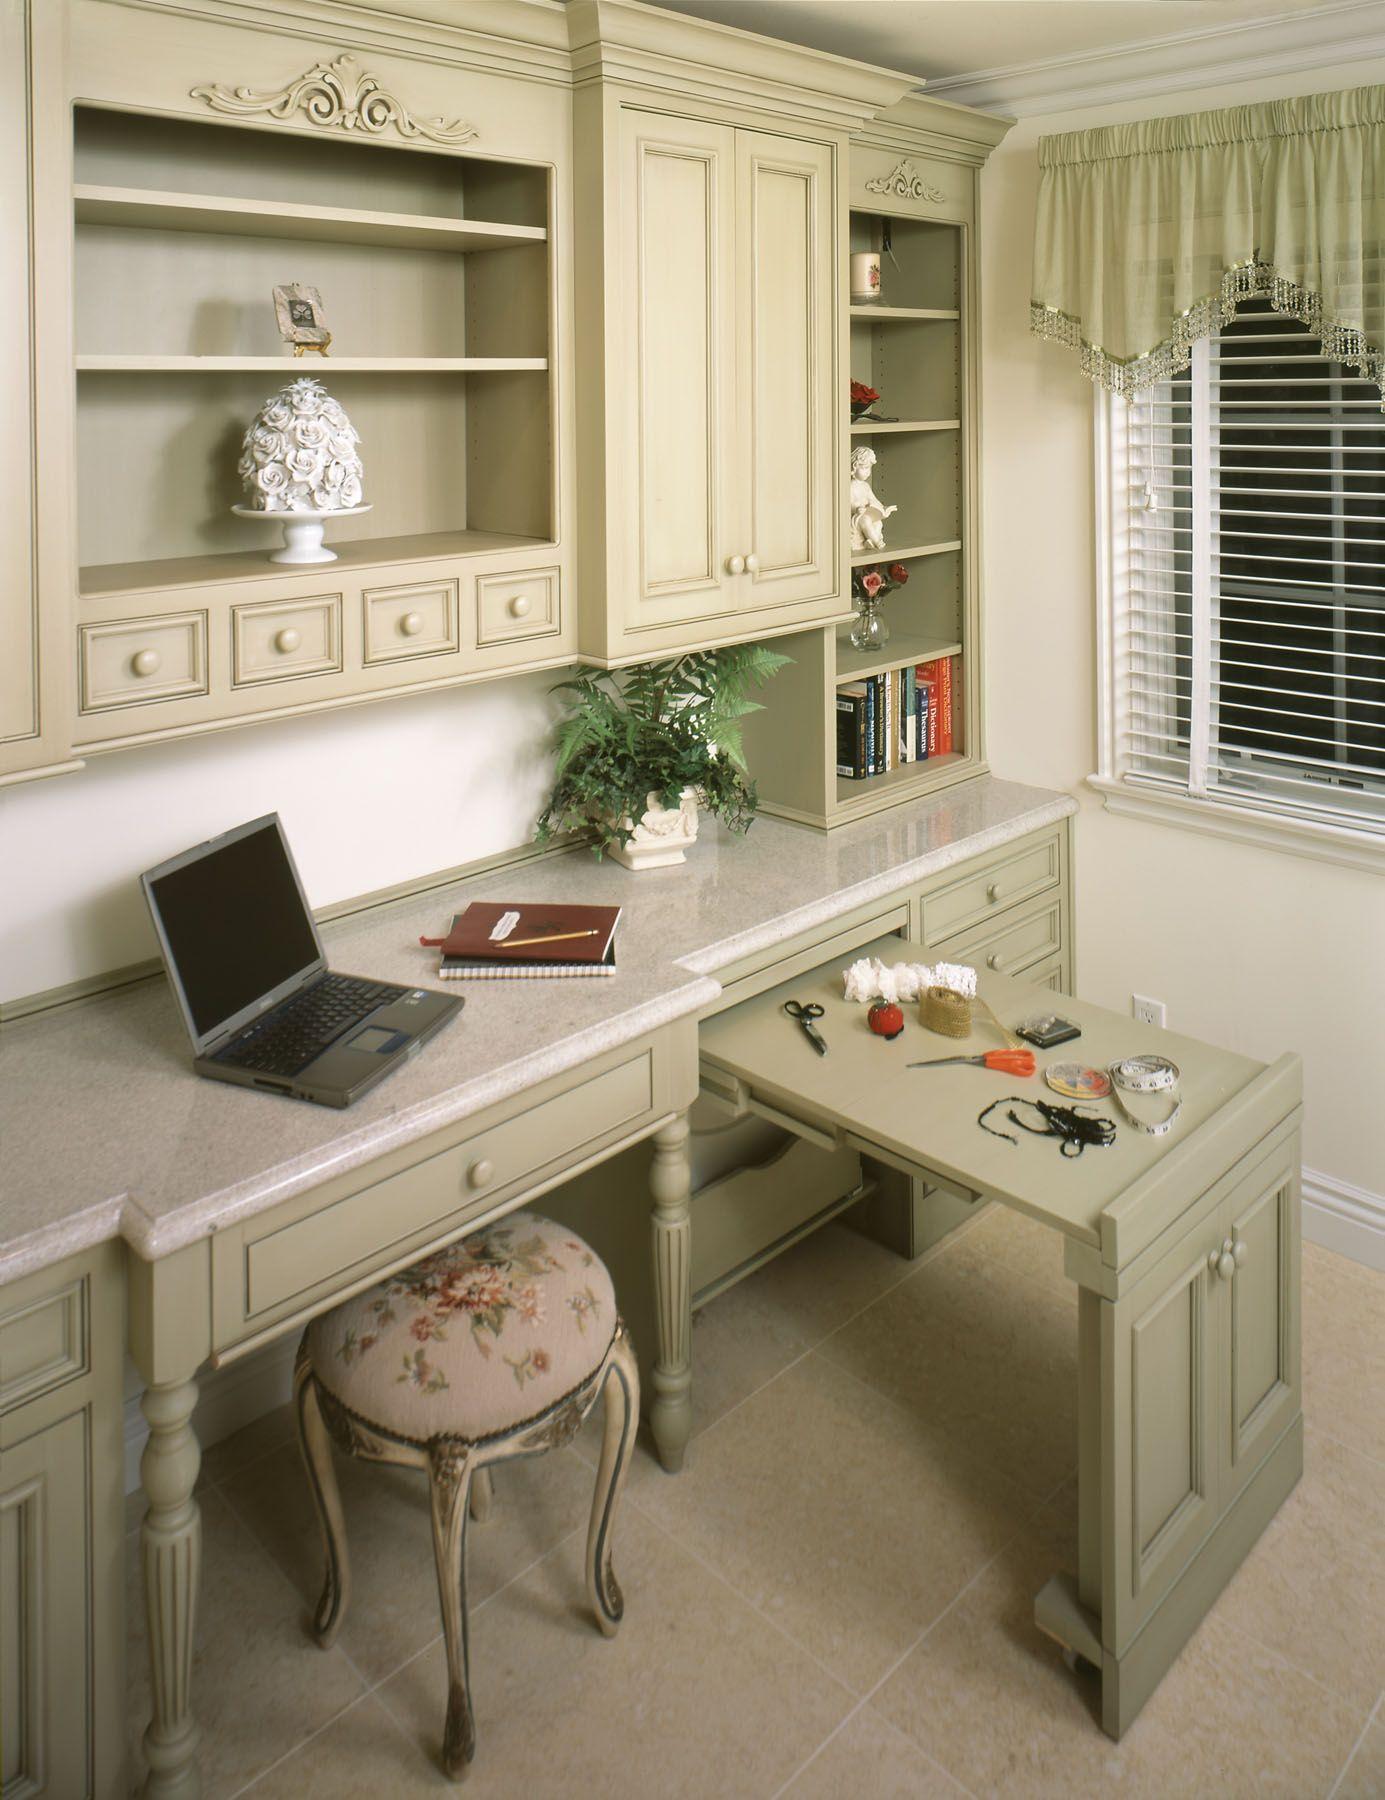 10x10 Room Layout Craft: Custom Wood Products #builtin #craftroom #cabinets